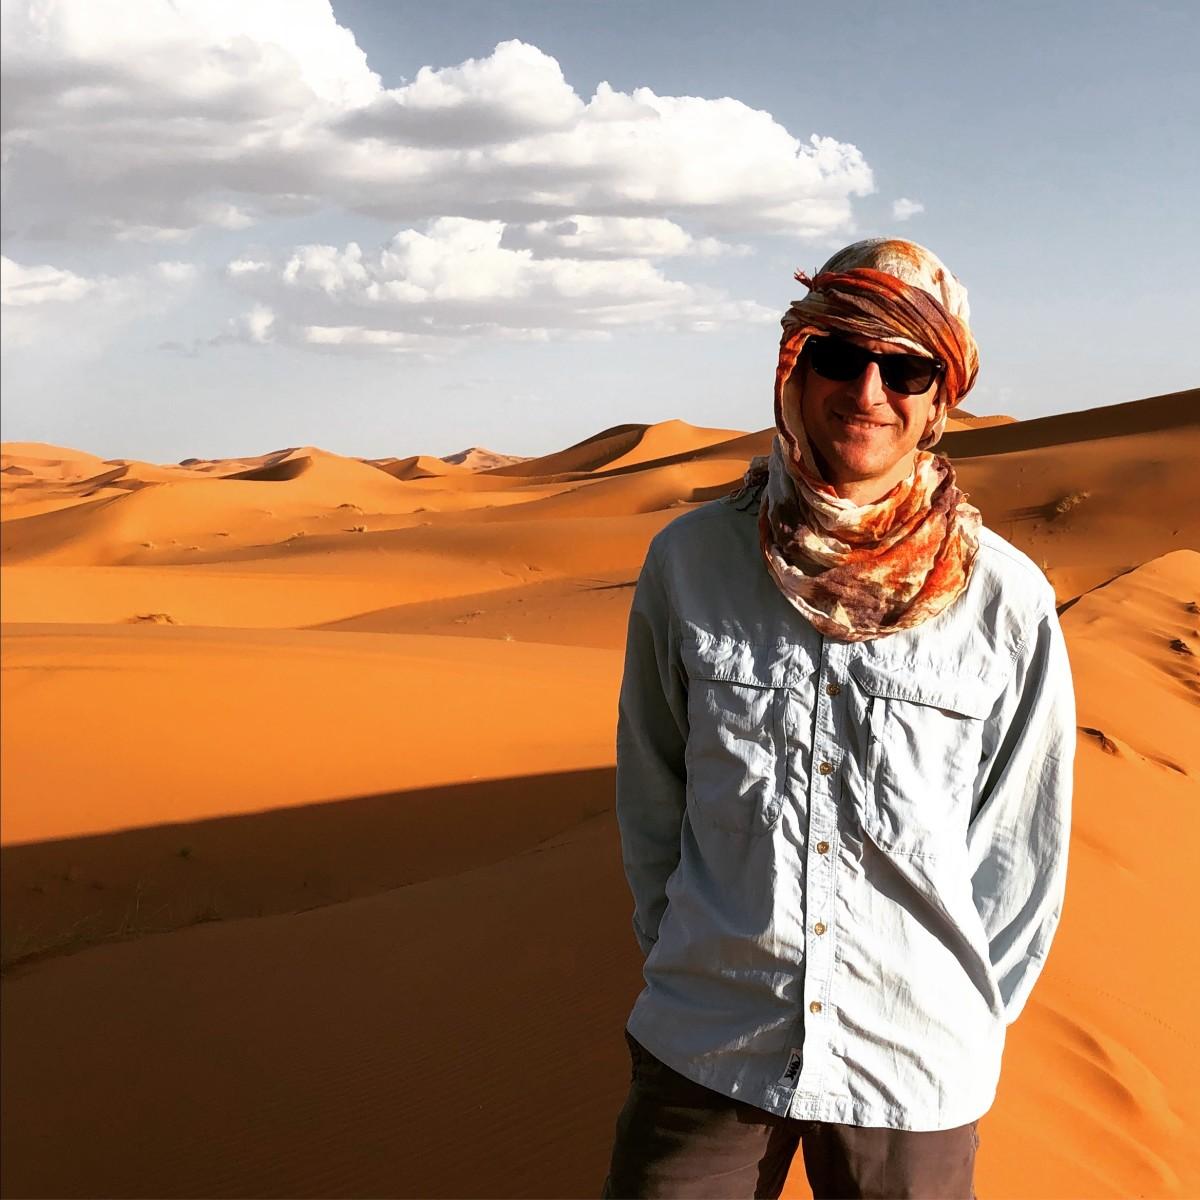 AJ Leveille in Morocco